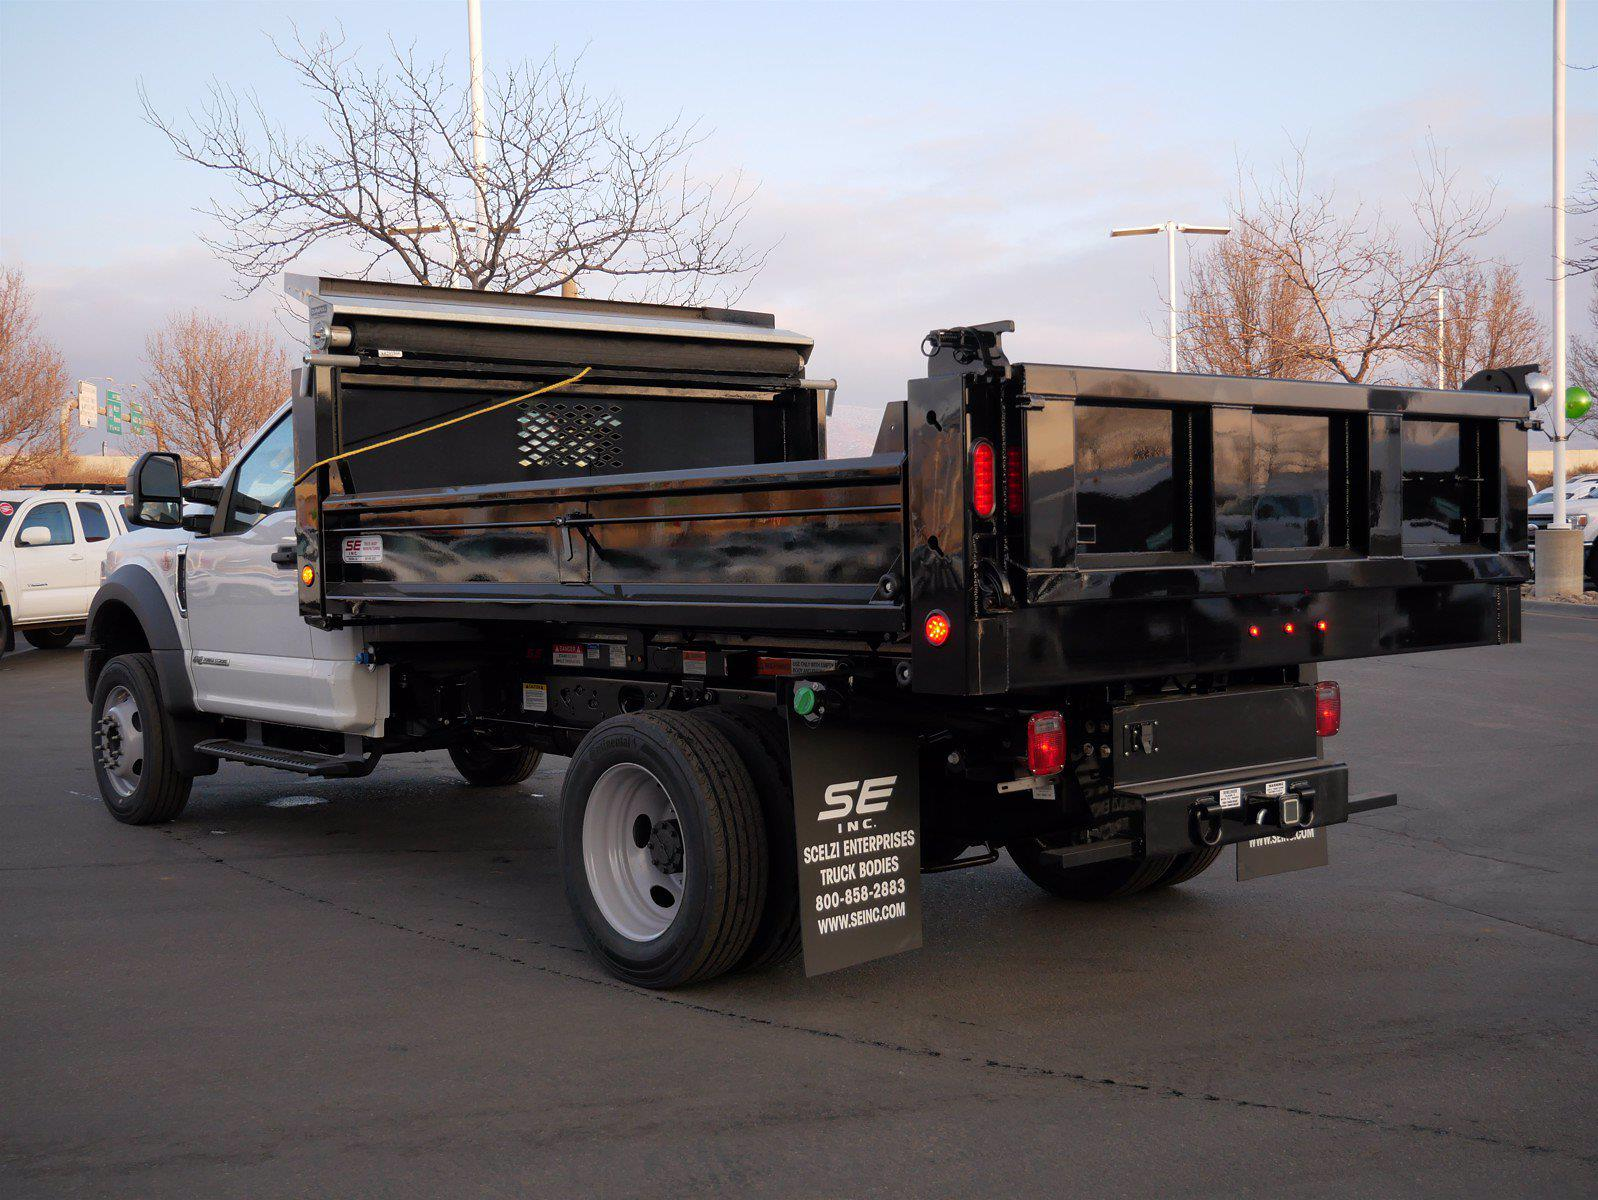 2021 Ford F-550 Regular Cab DRW 4x4, Scelzi Dump Body #64083 - photo 2